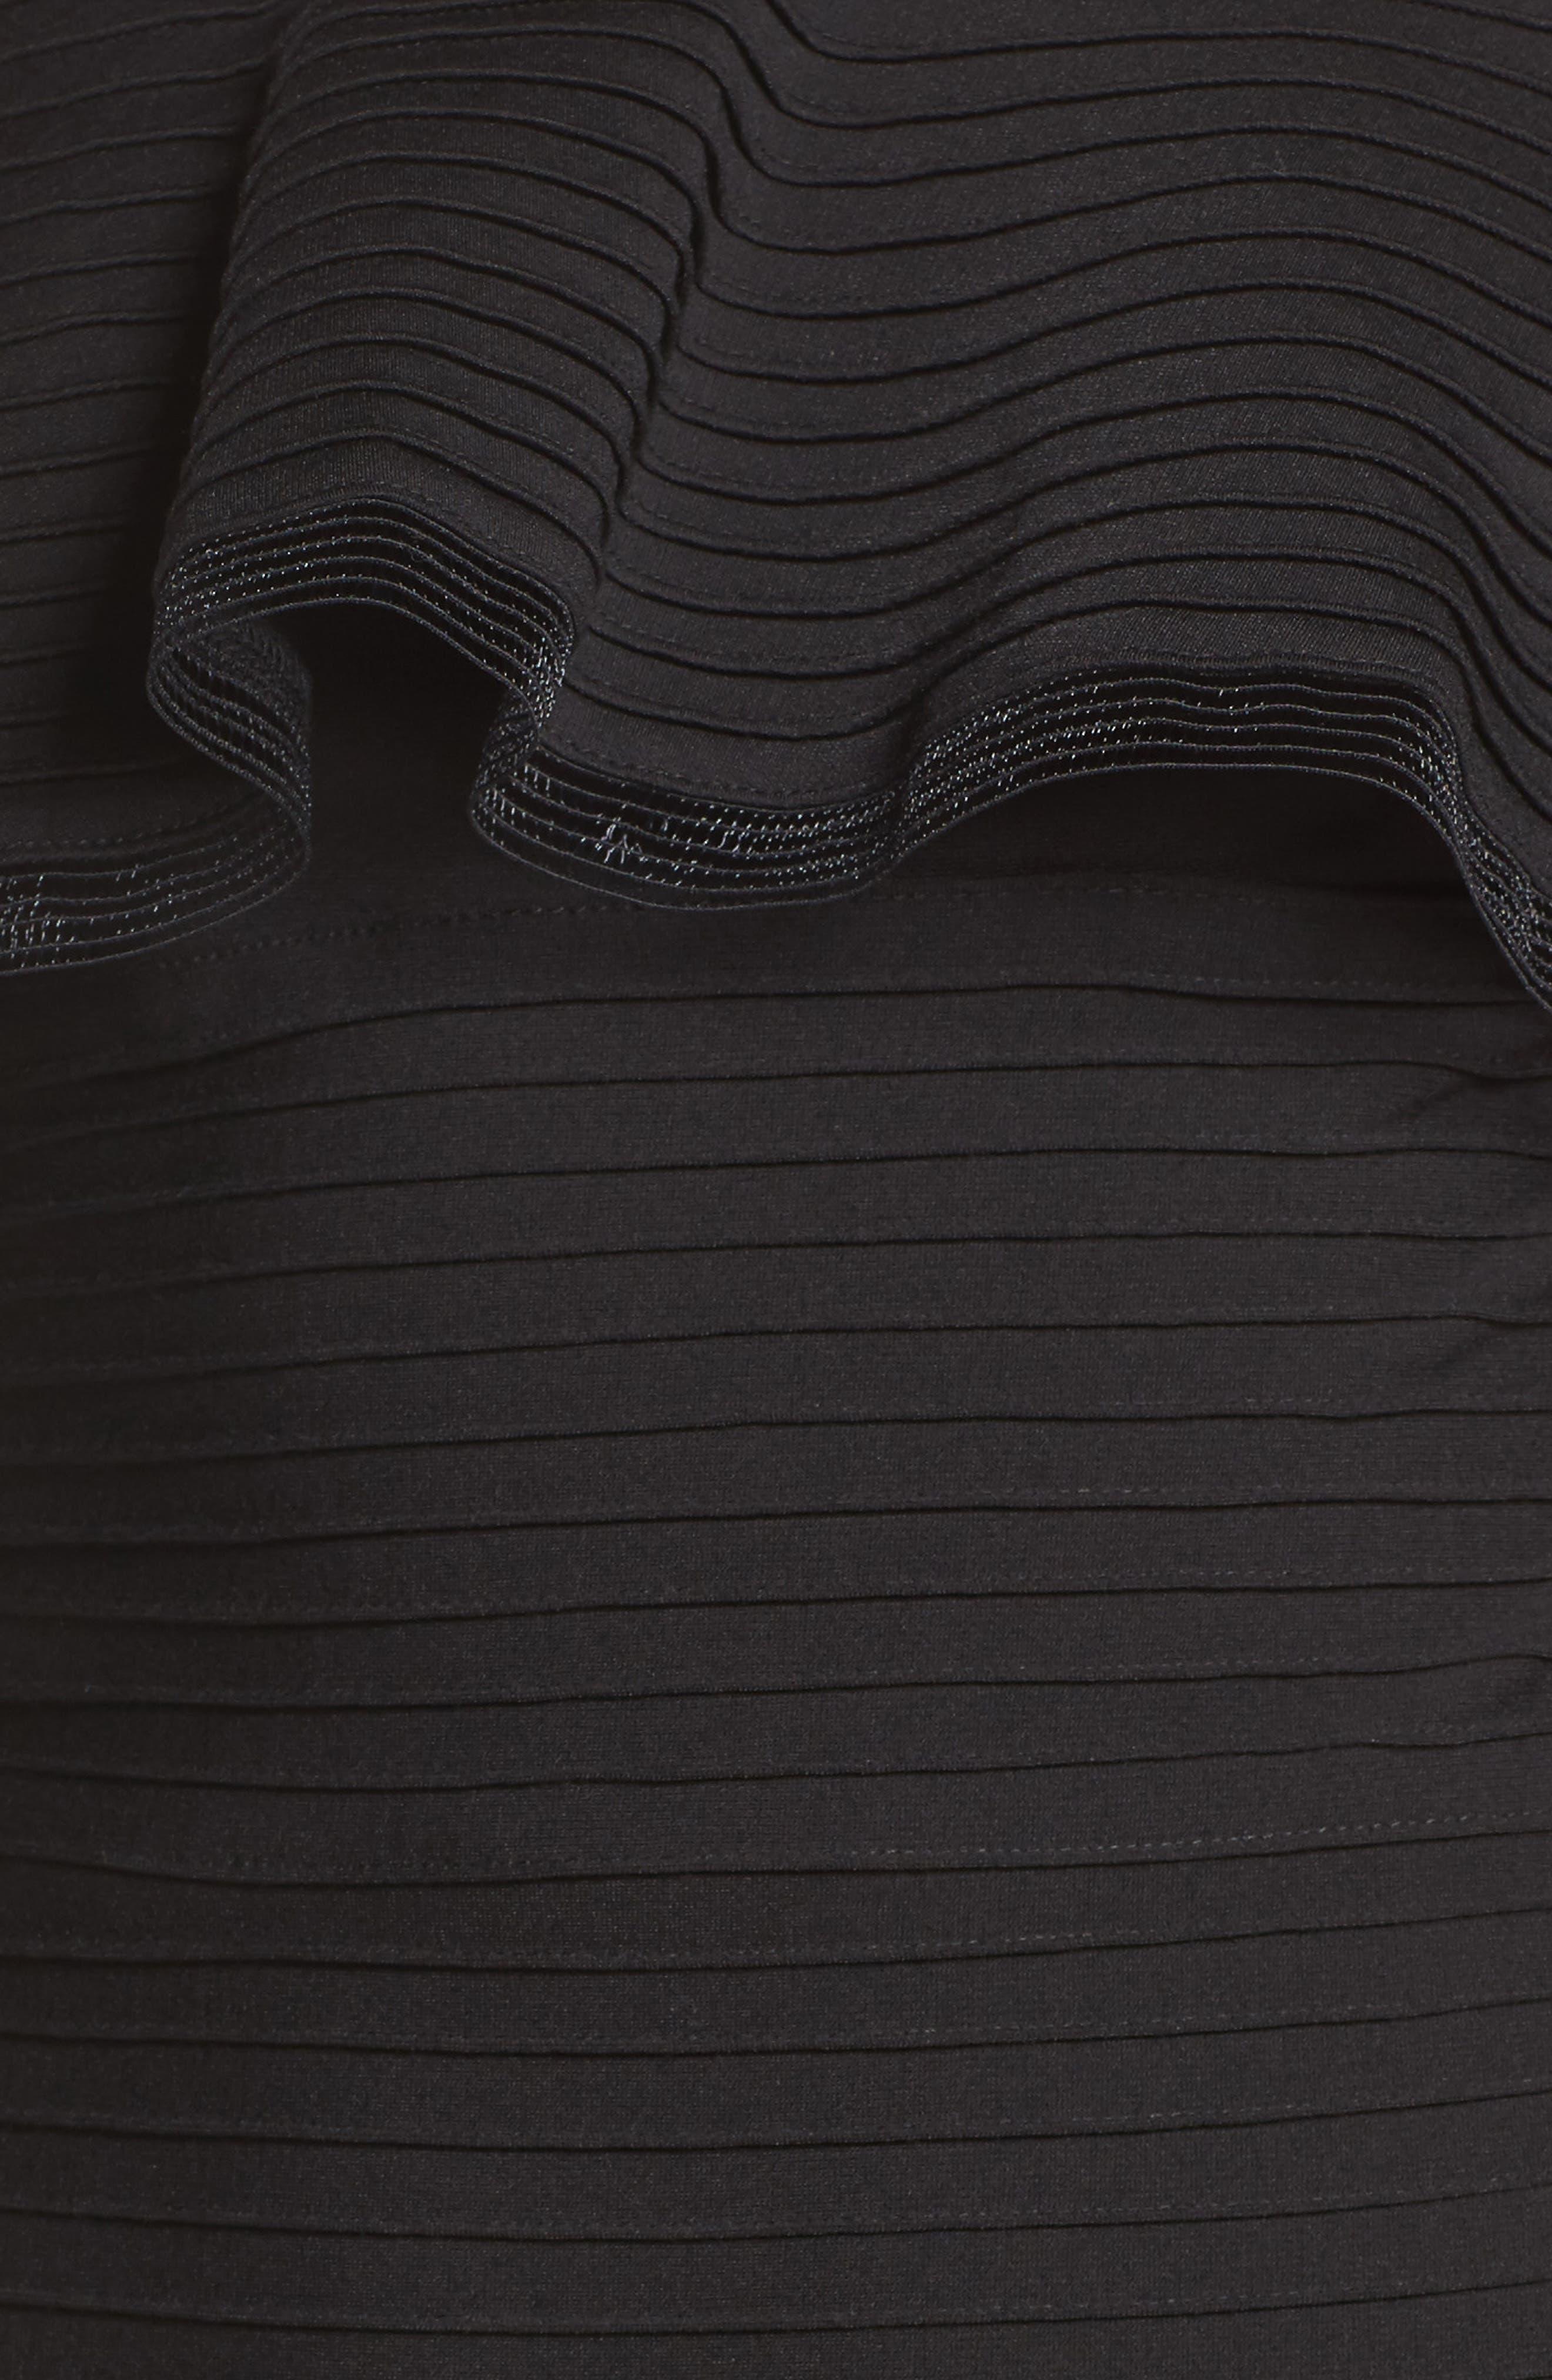 Jersey Sheath Dress,                             Alternate thumbnail 6, color,                             001